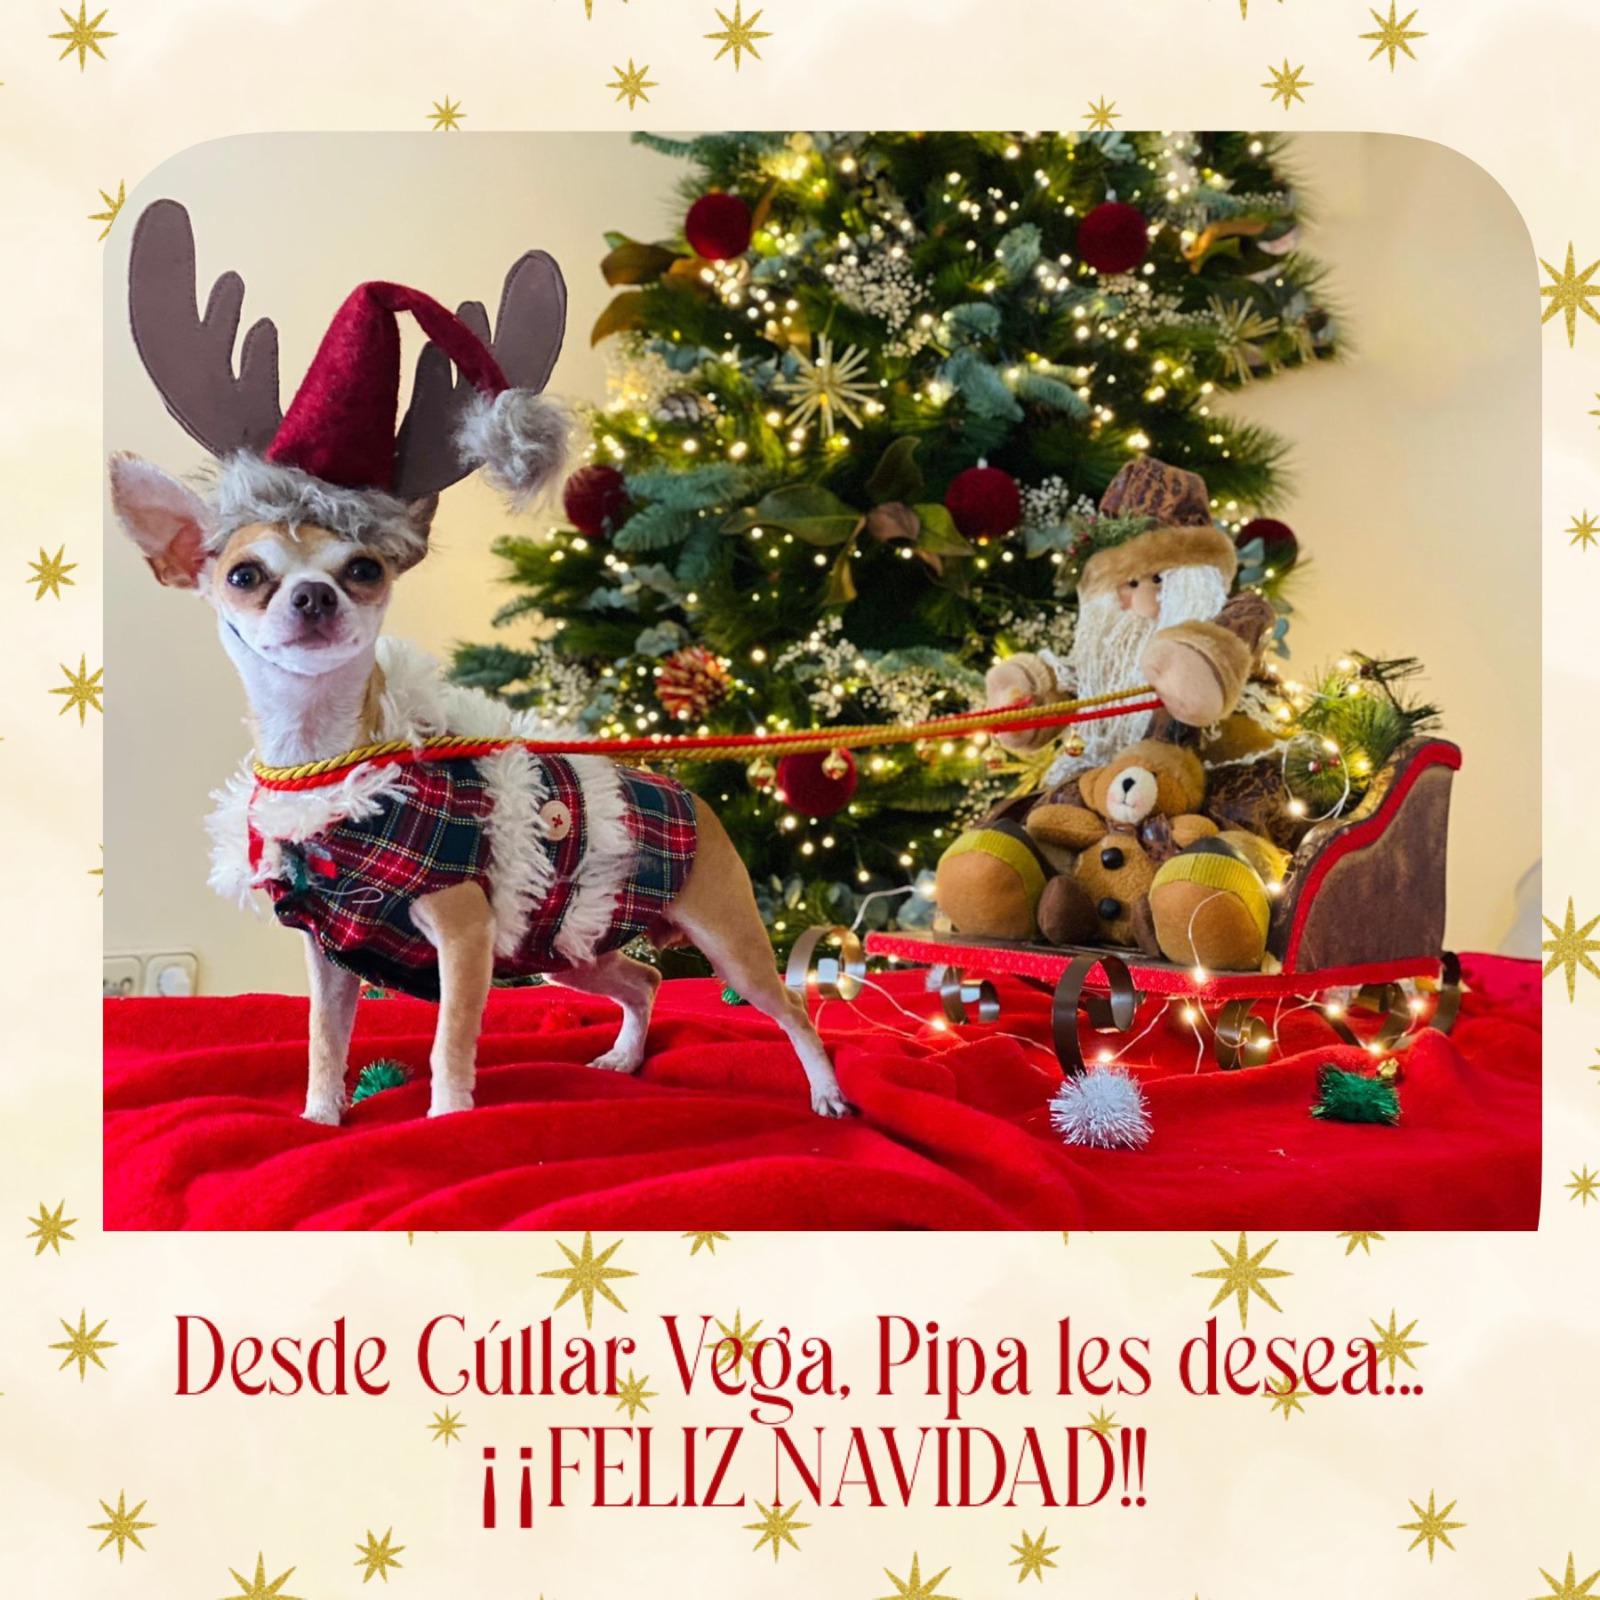 Ganadores del I Concurso de Christmas de Mascotas